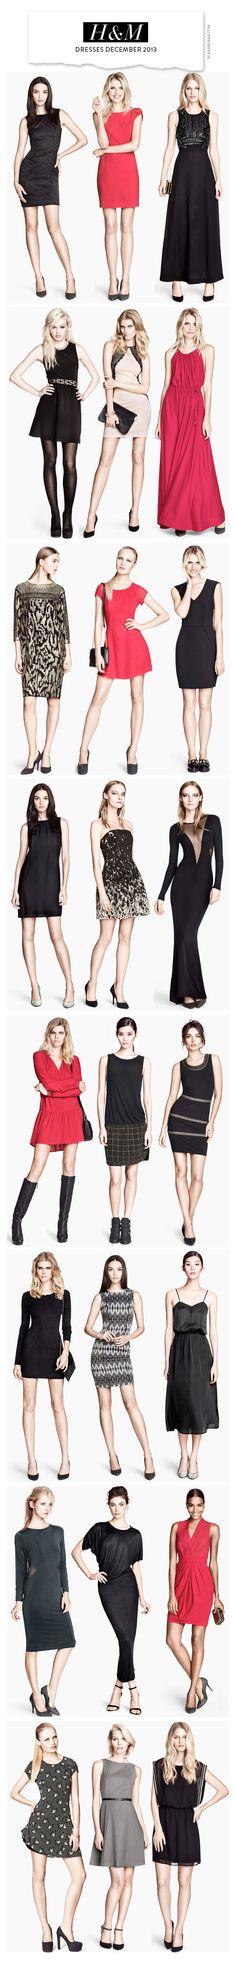 H&M Dresses Dezember 2013